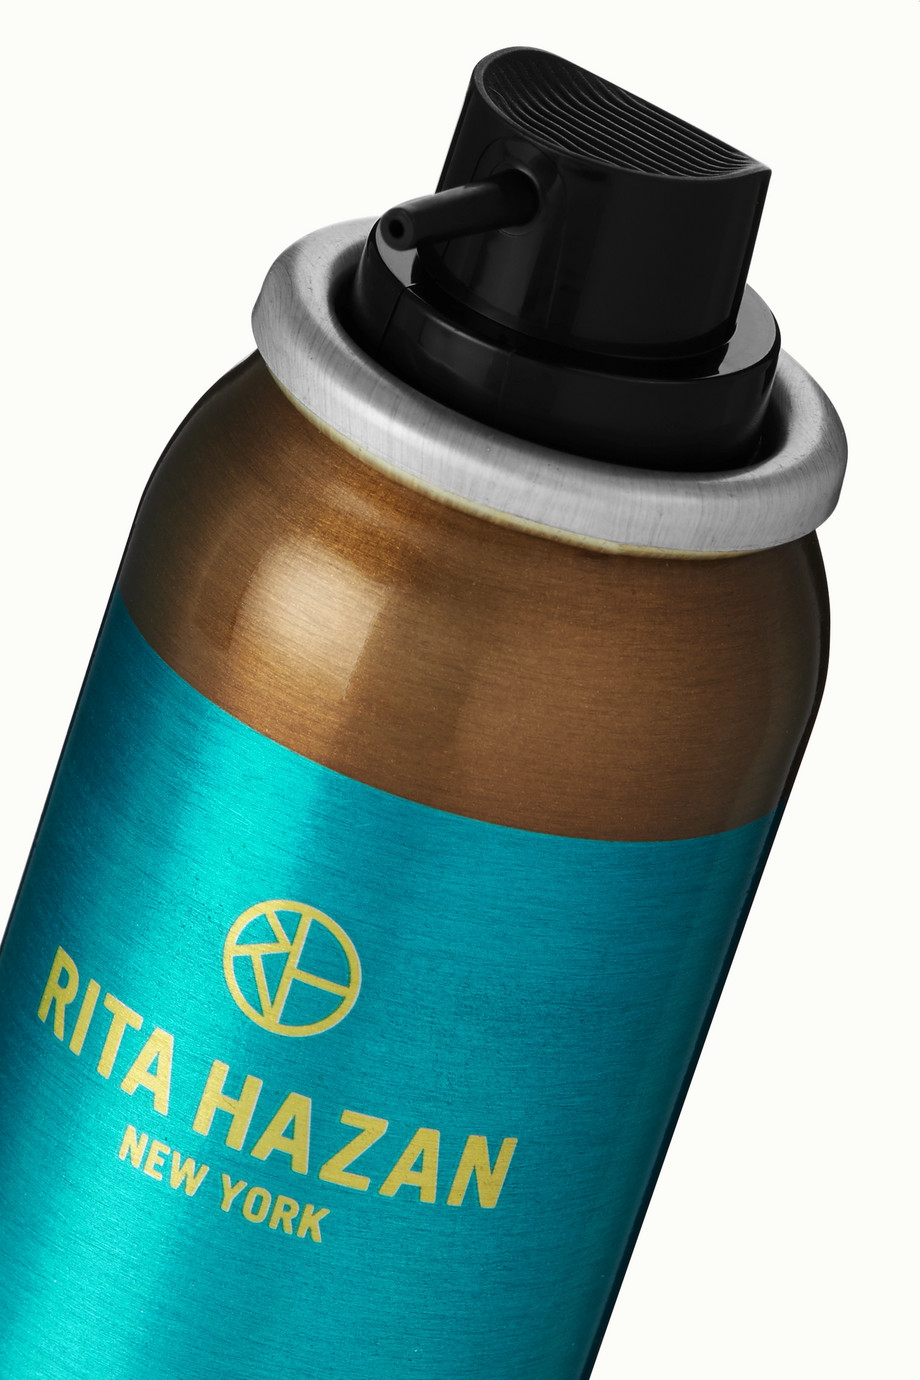 Rita Hazan Spray retouche racines, Light Brown, 57 g